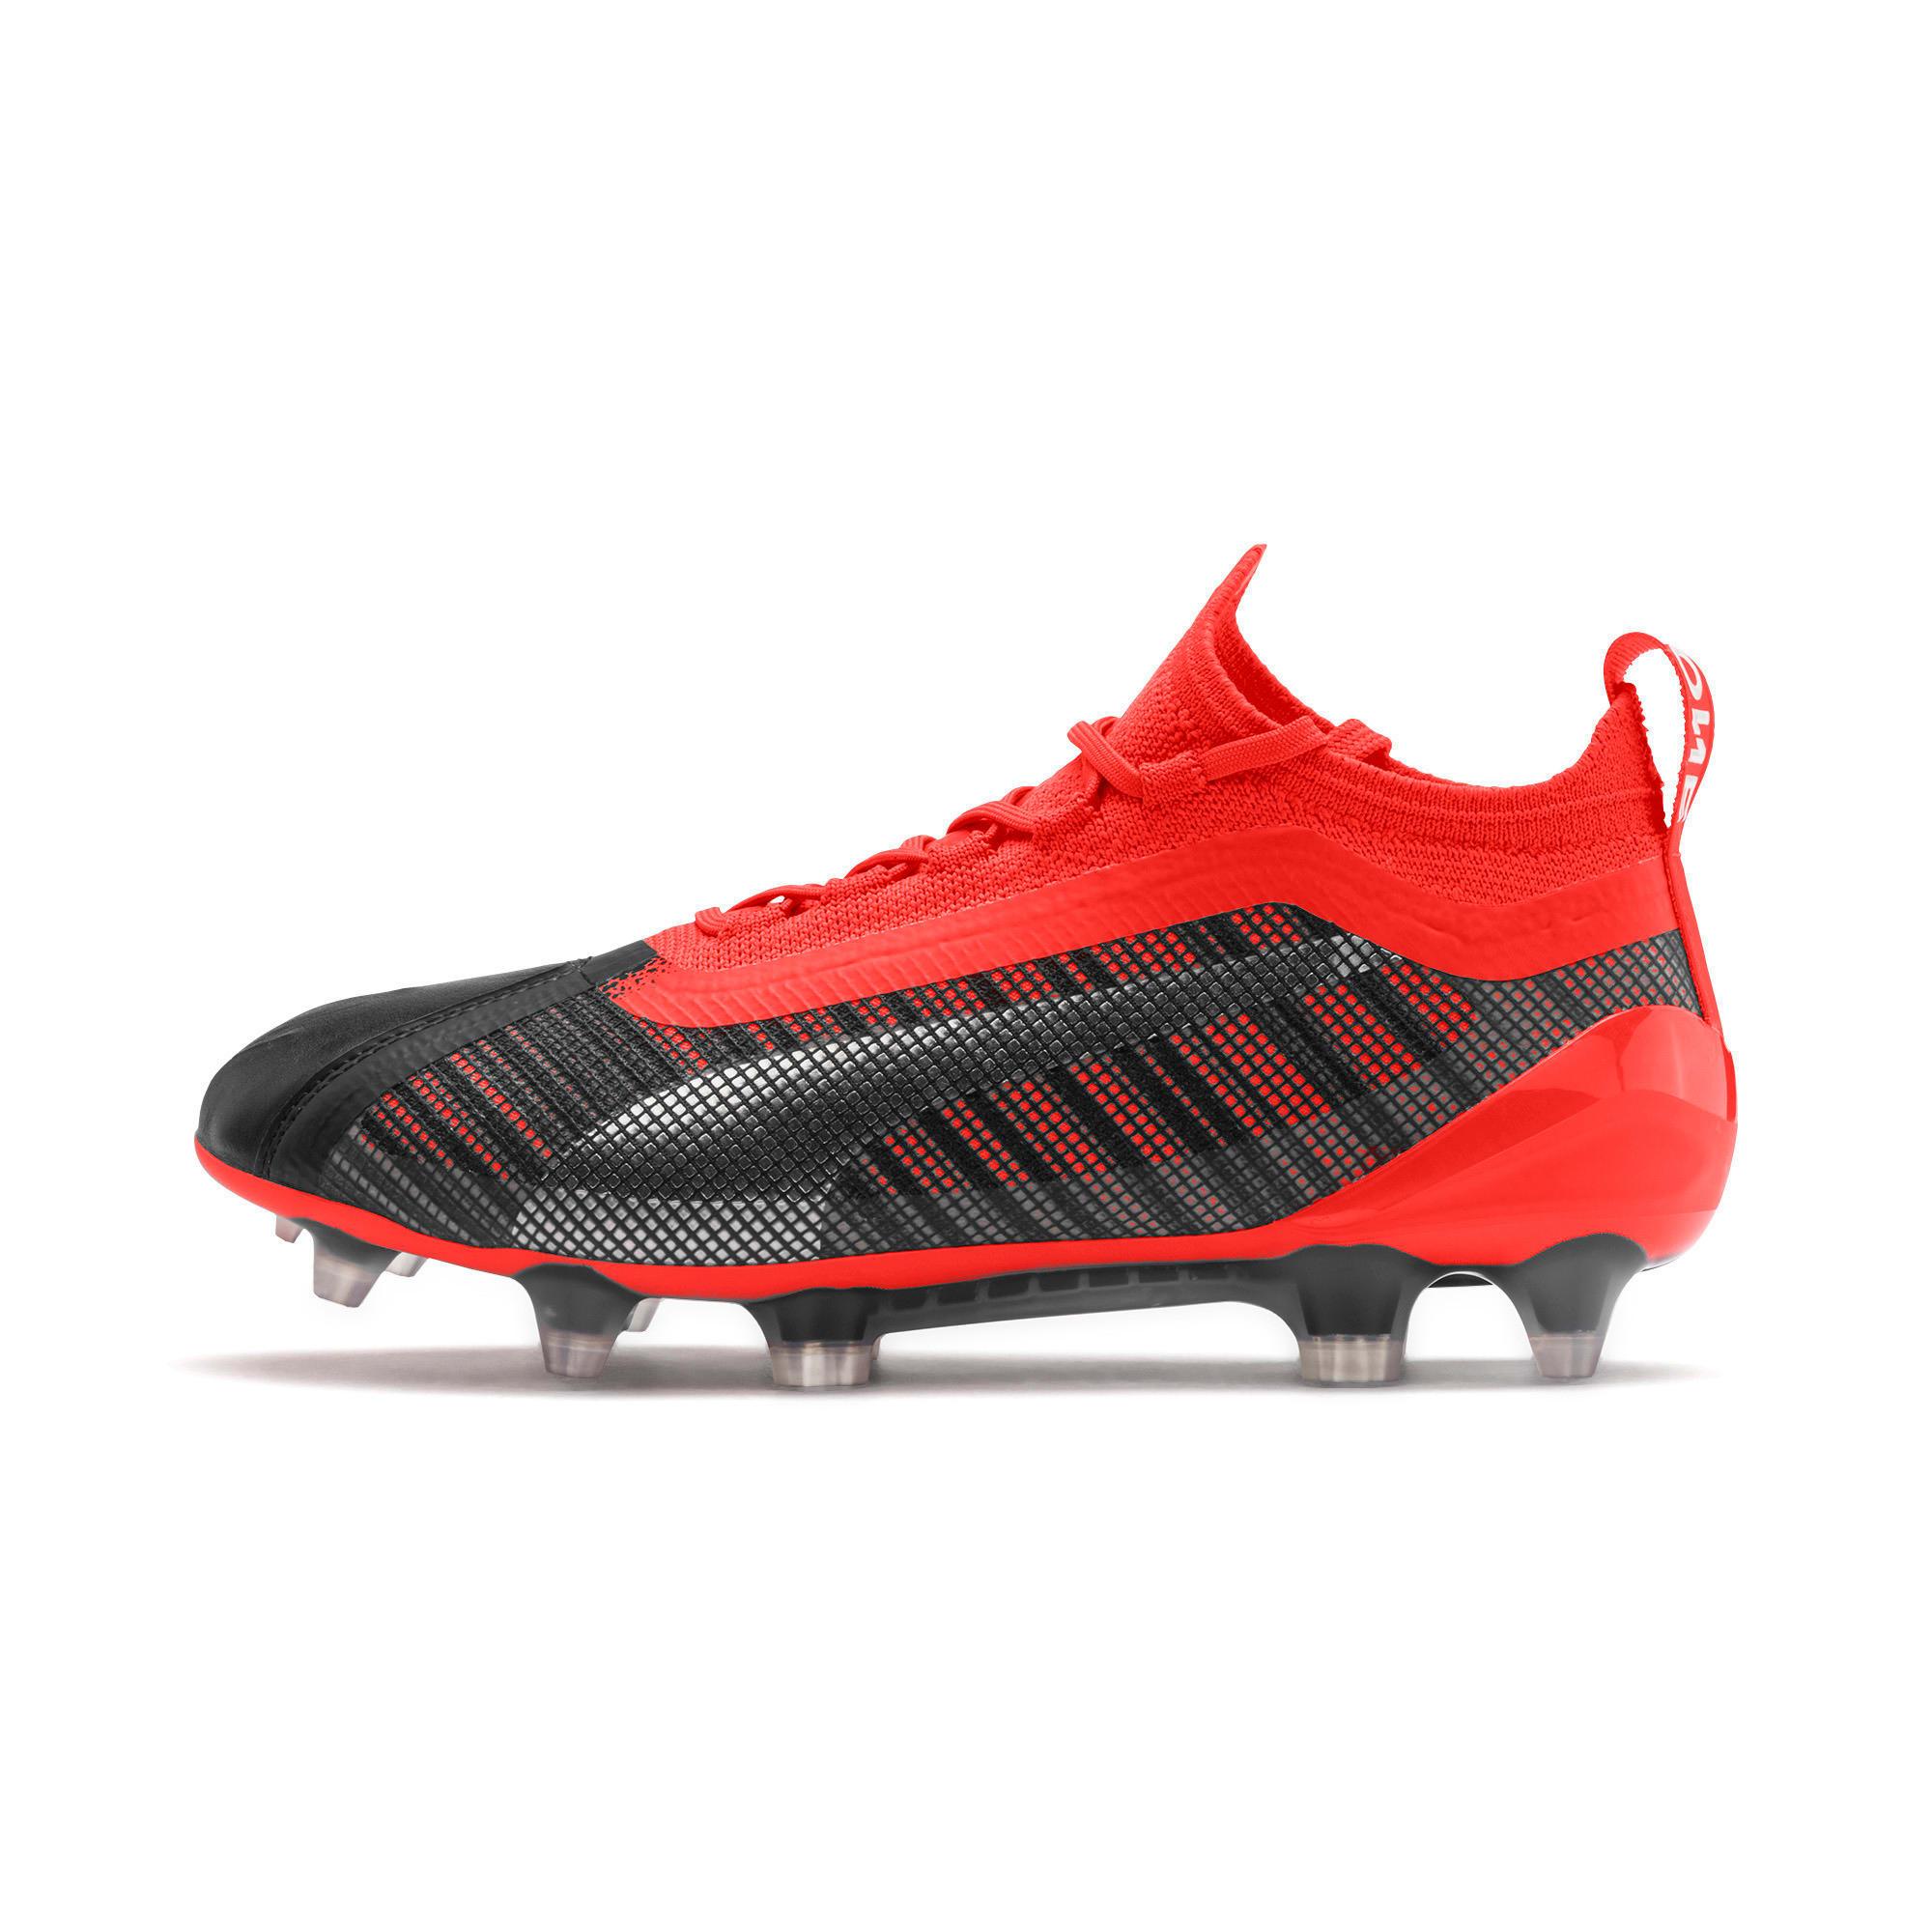 Thumbnail 1 of PUMA ONE 5.1 FG/AG Soccer Cleats JR, Black-Nrgy Red-Aged Silver, medium